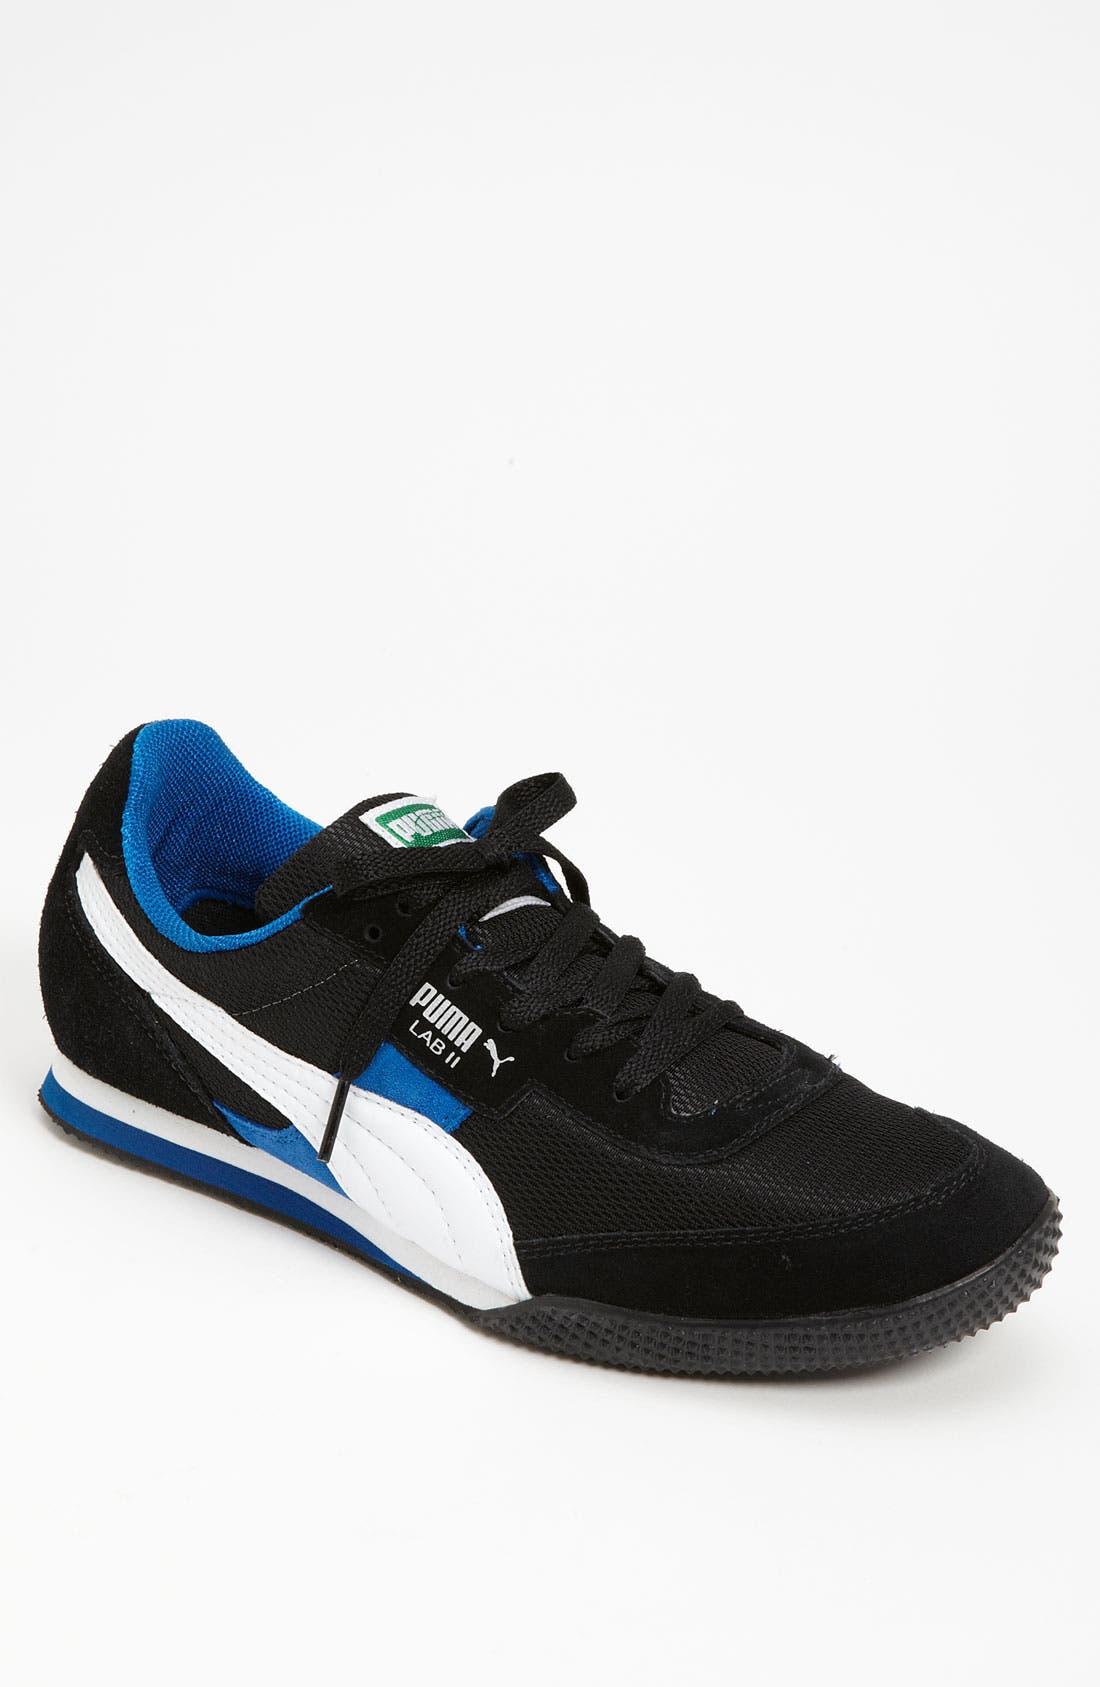 PUMA 'Lab II FB' Sneaker, Main, color, 001